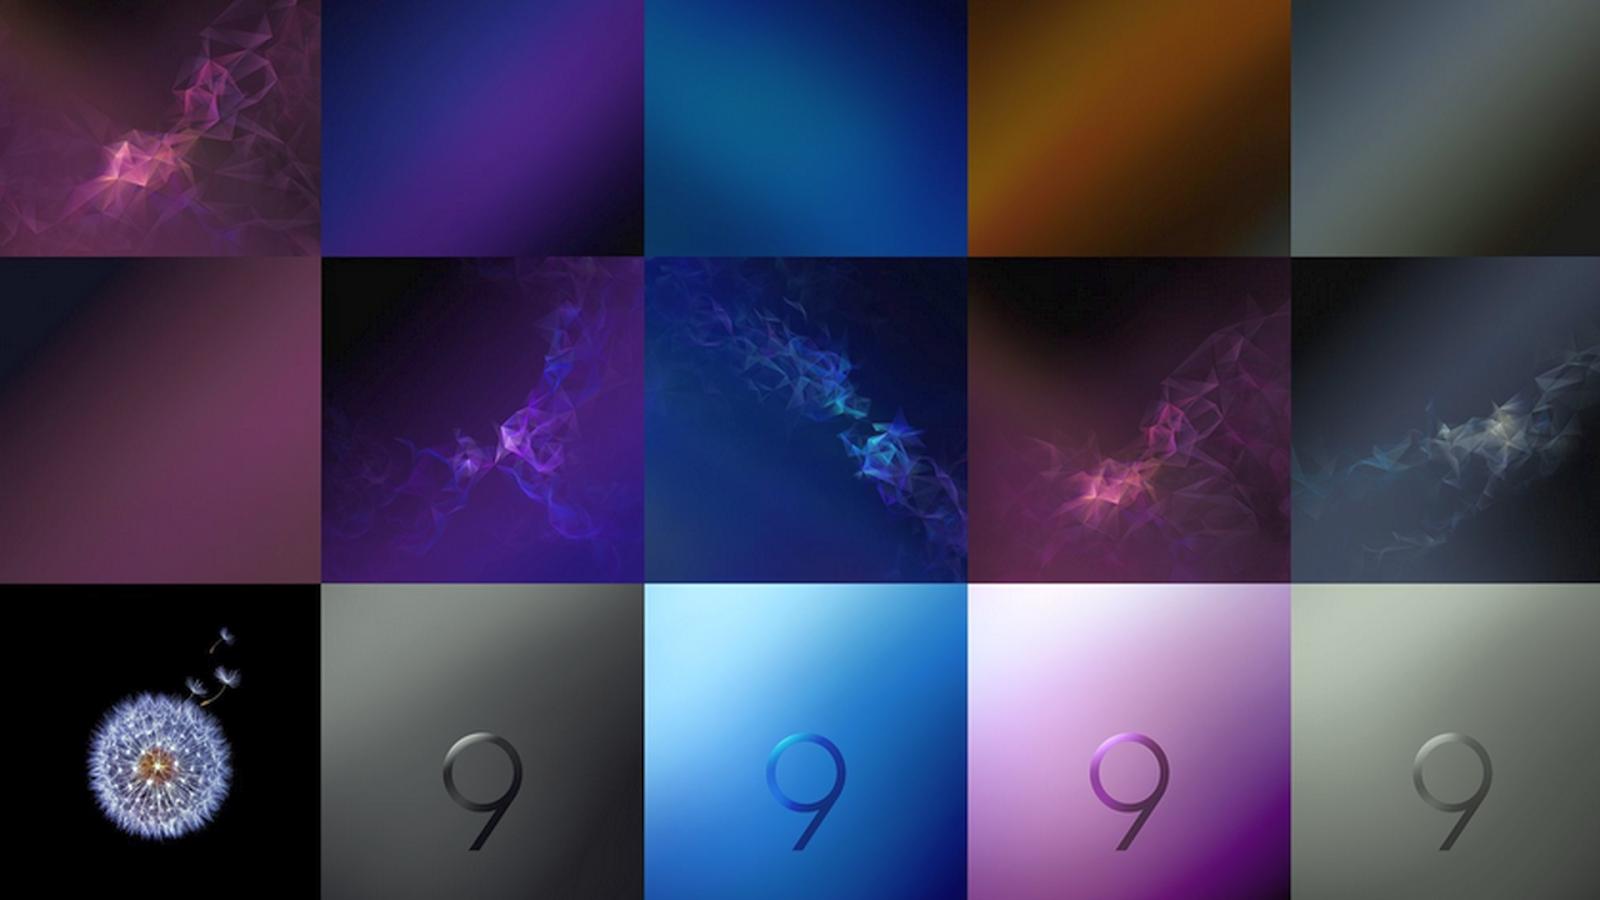 Samsung Galaxy Note 9 Wallpaper Hd Cellular Futures